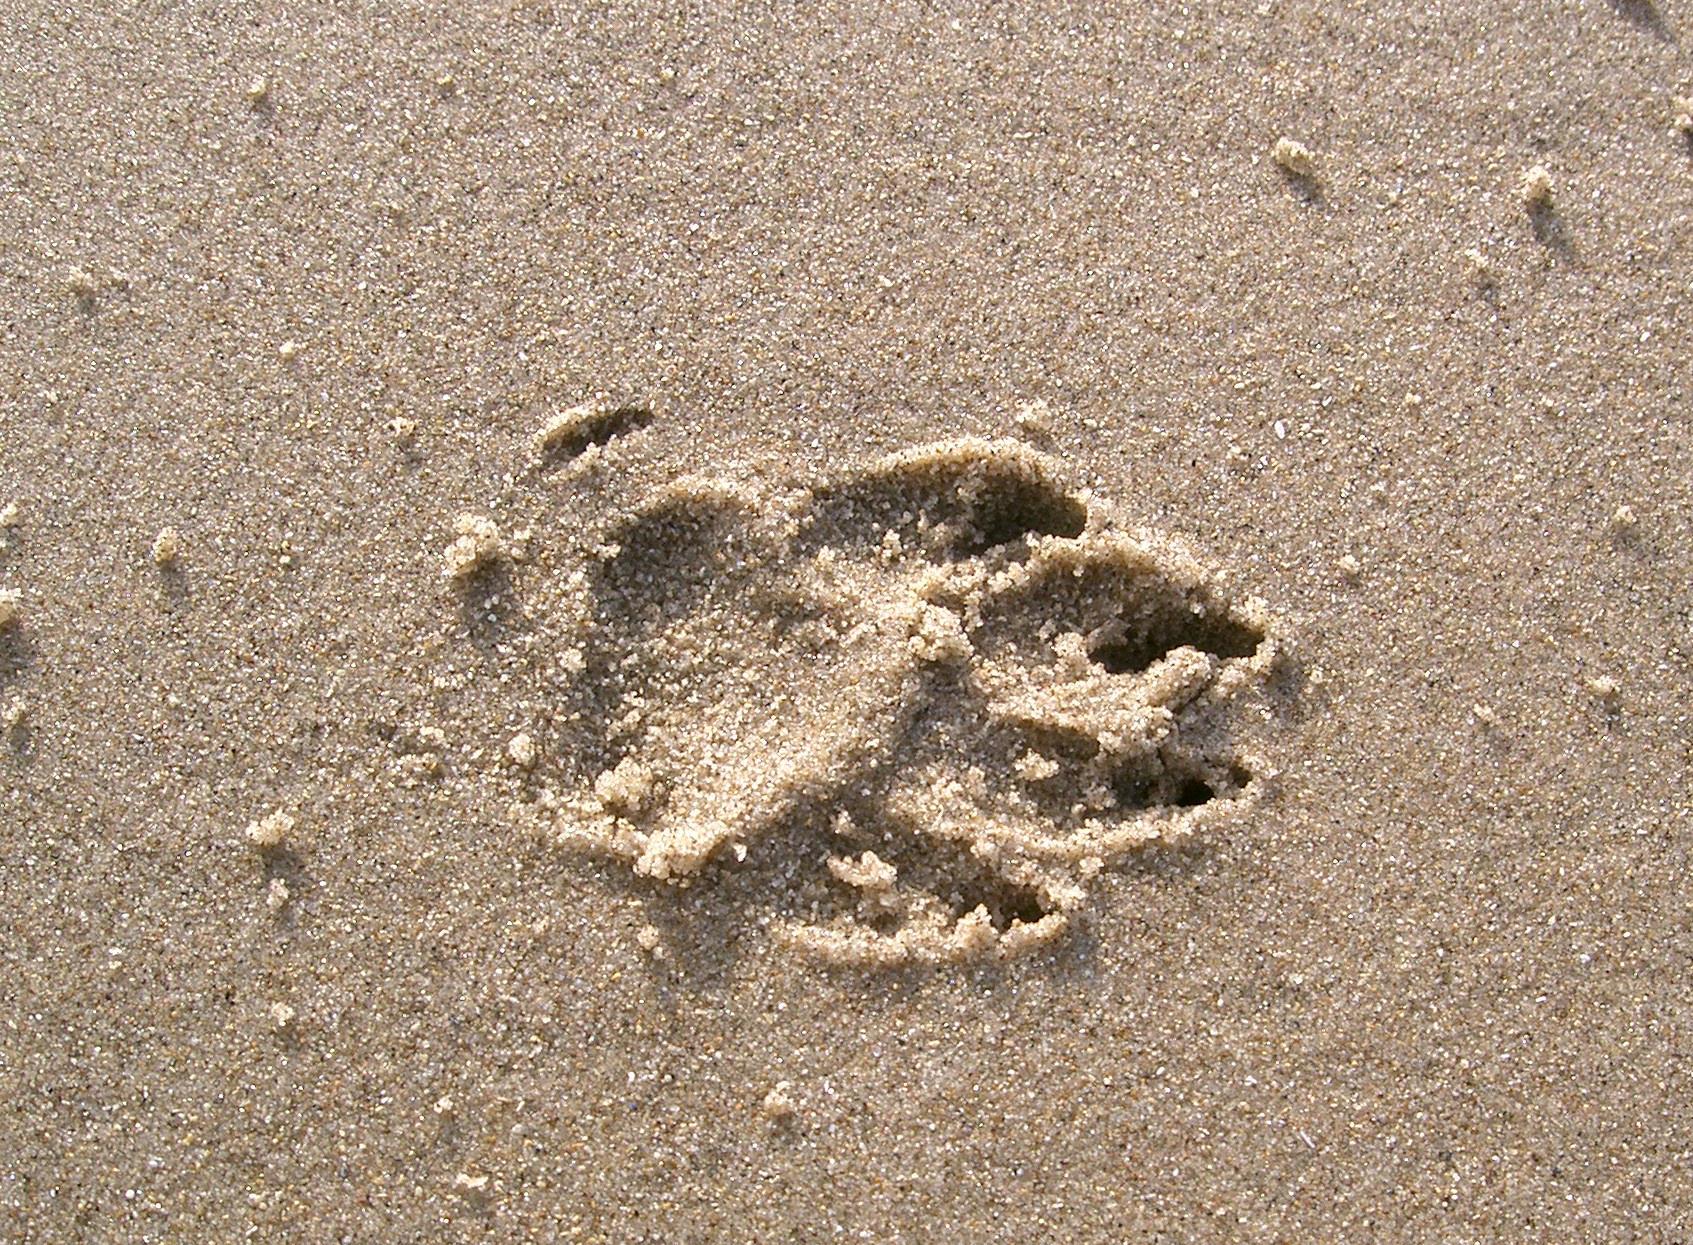 footprint 02: dog in sand by cyborgsuzystock